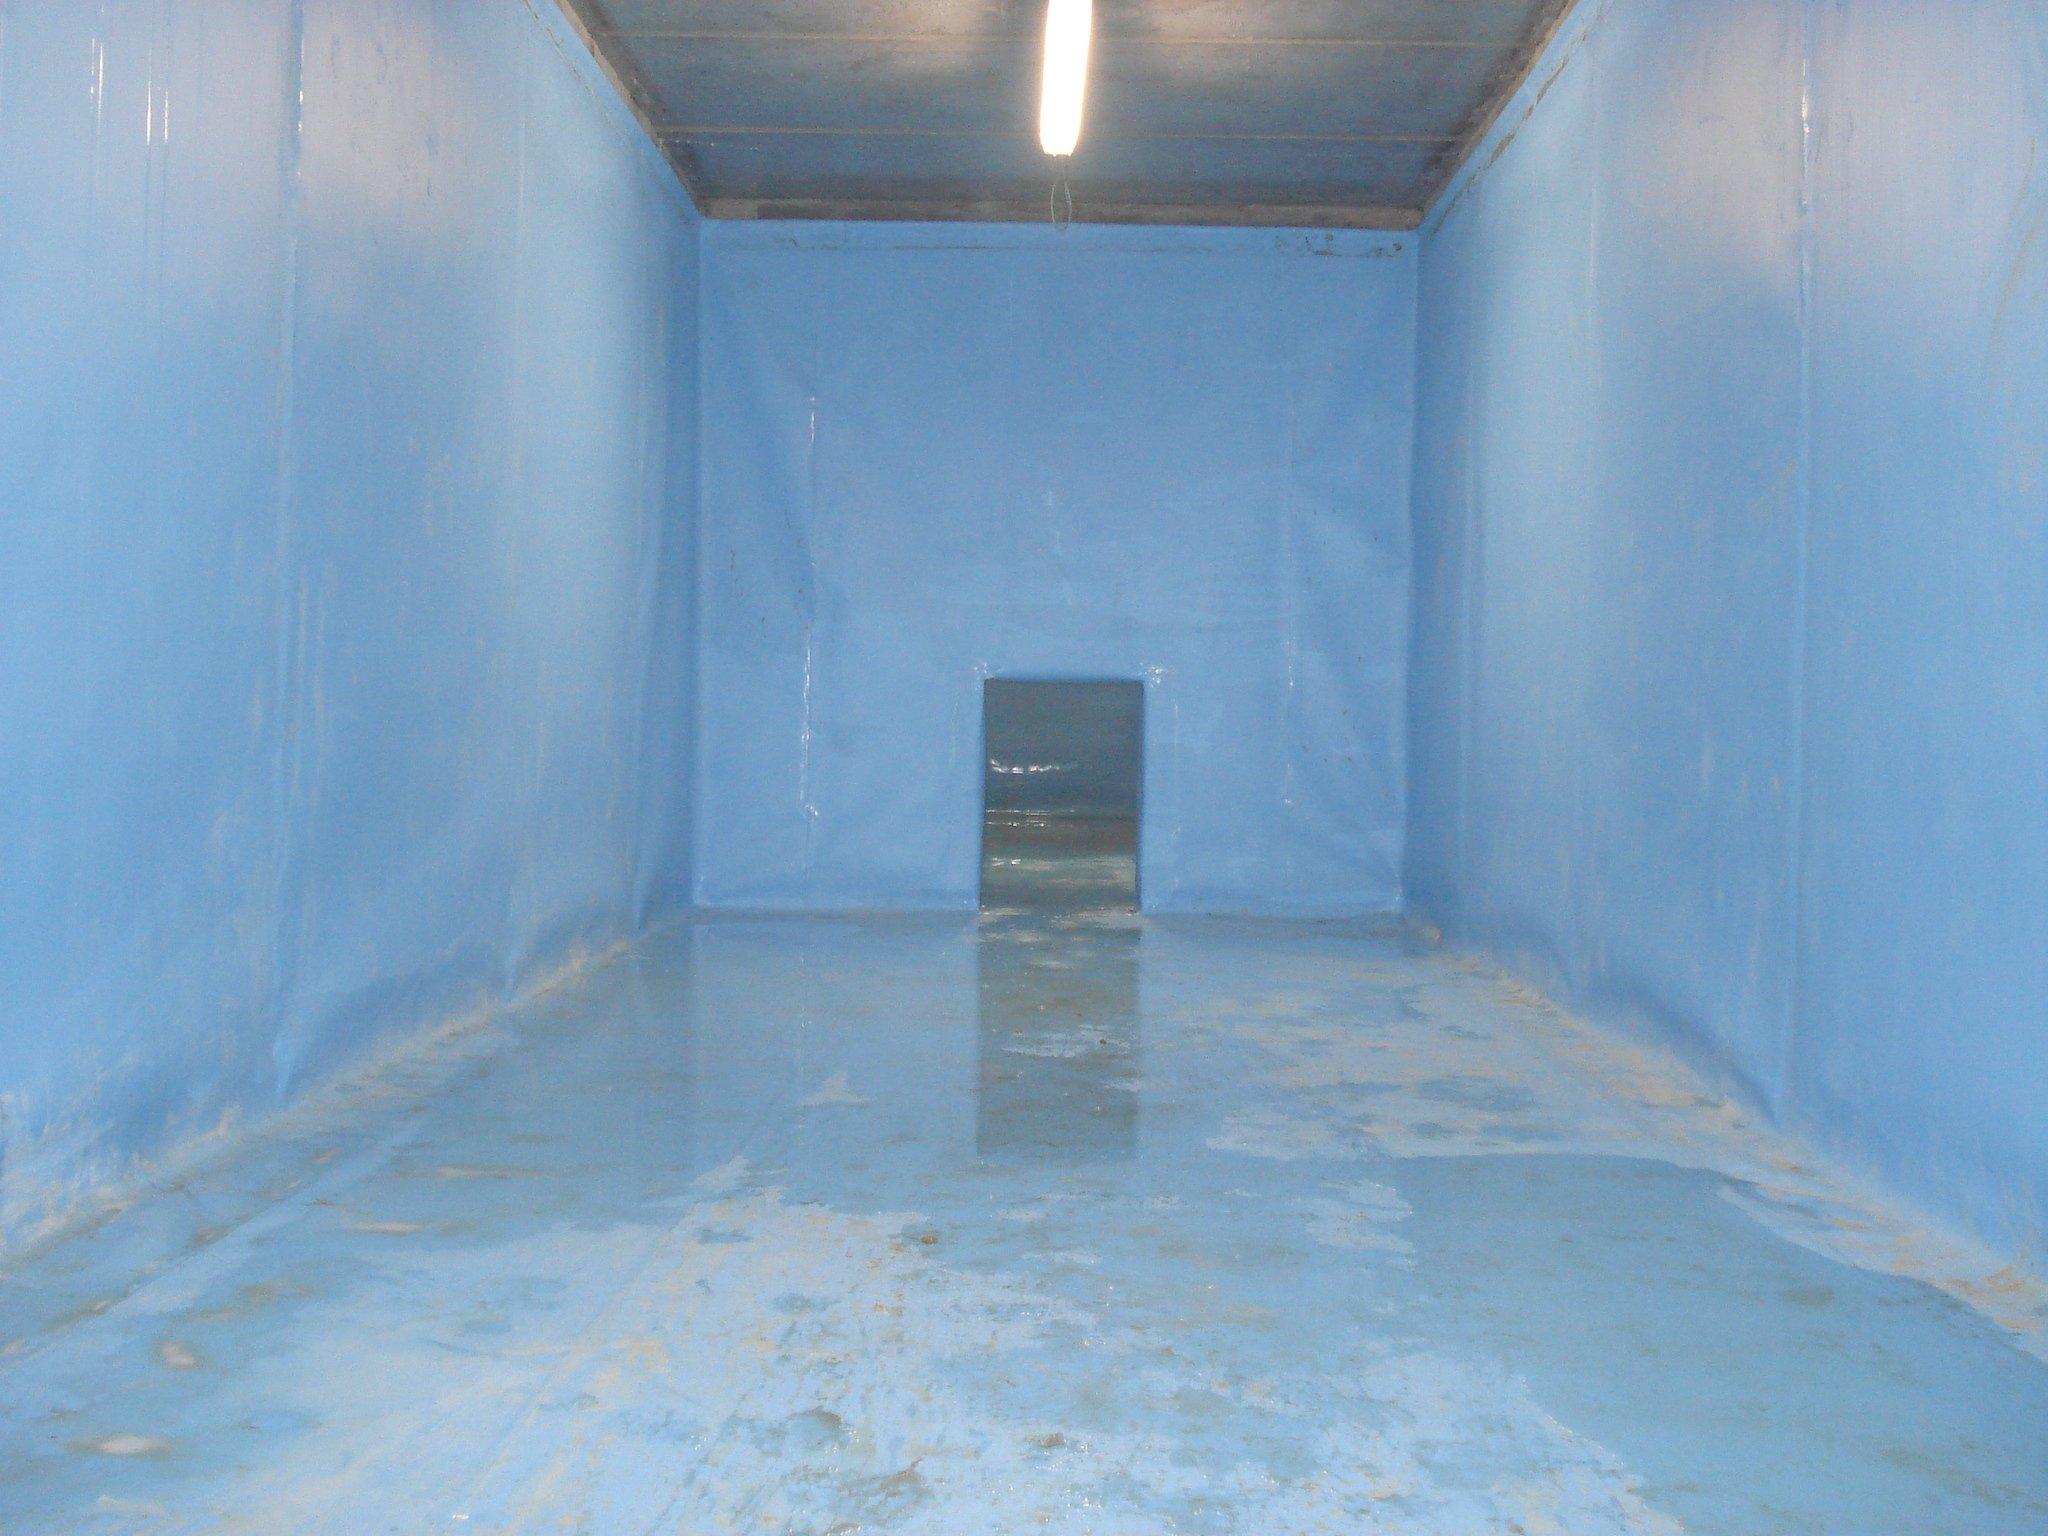 impermeabilizzazione di gallerie artificiali